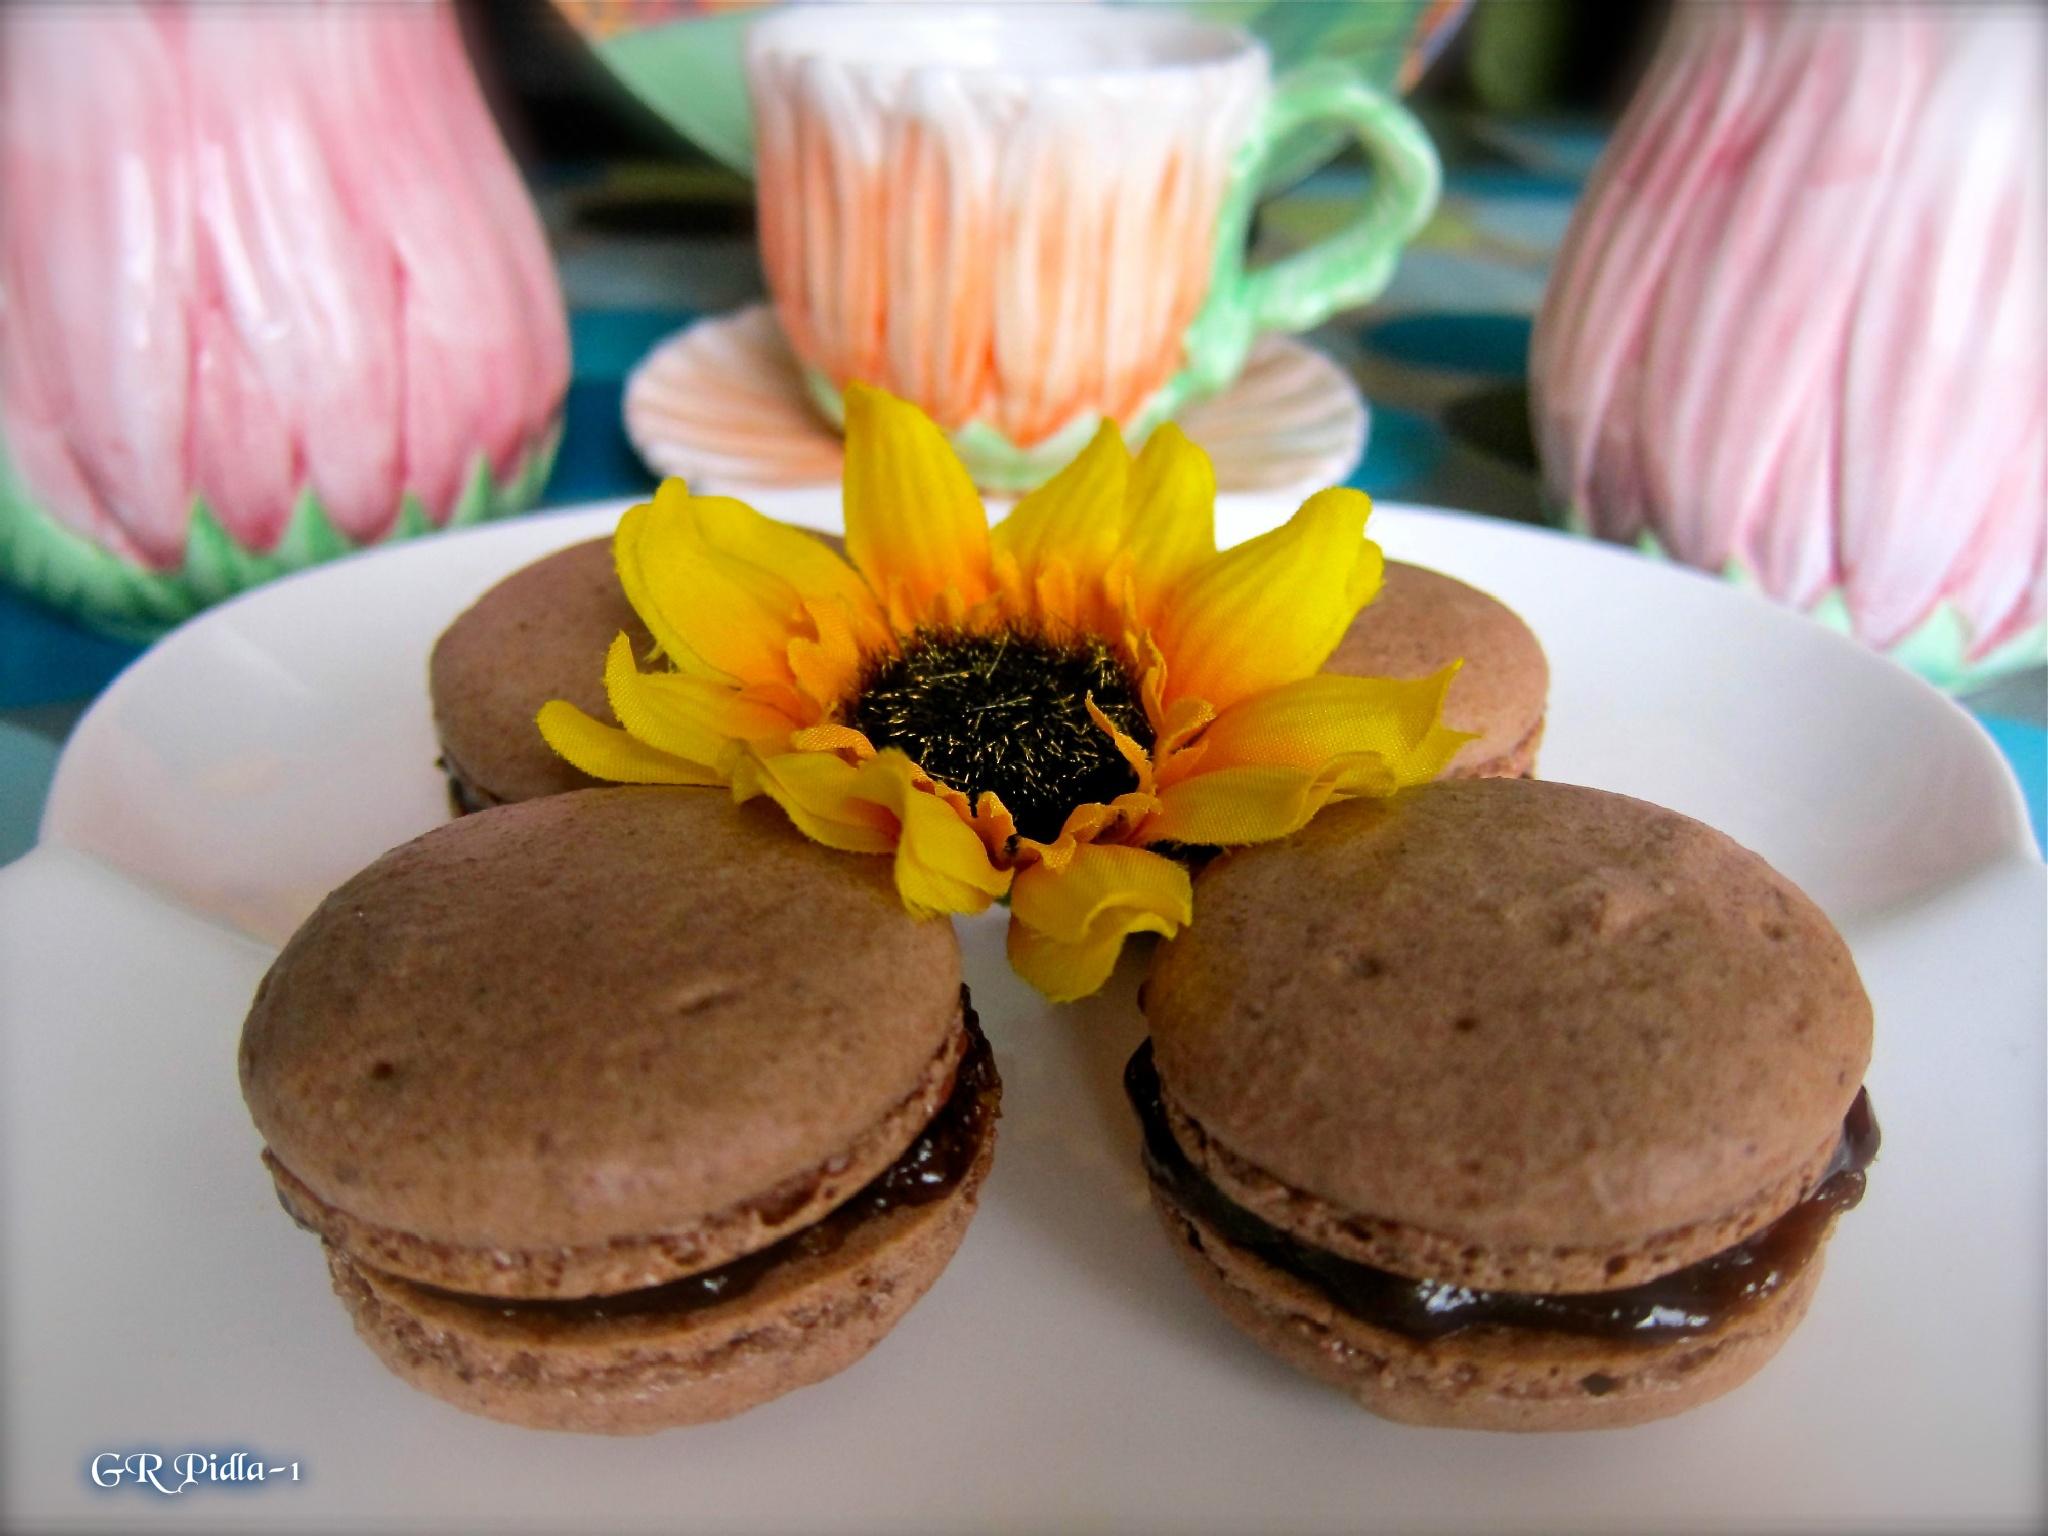 cafe mocha macarons with chocolate ganache by Gina  Alwaysmile (*_*)